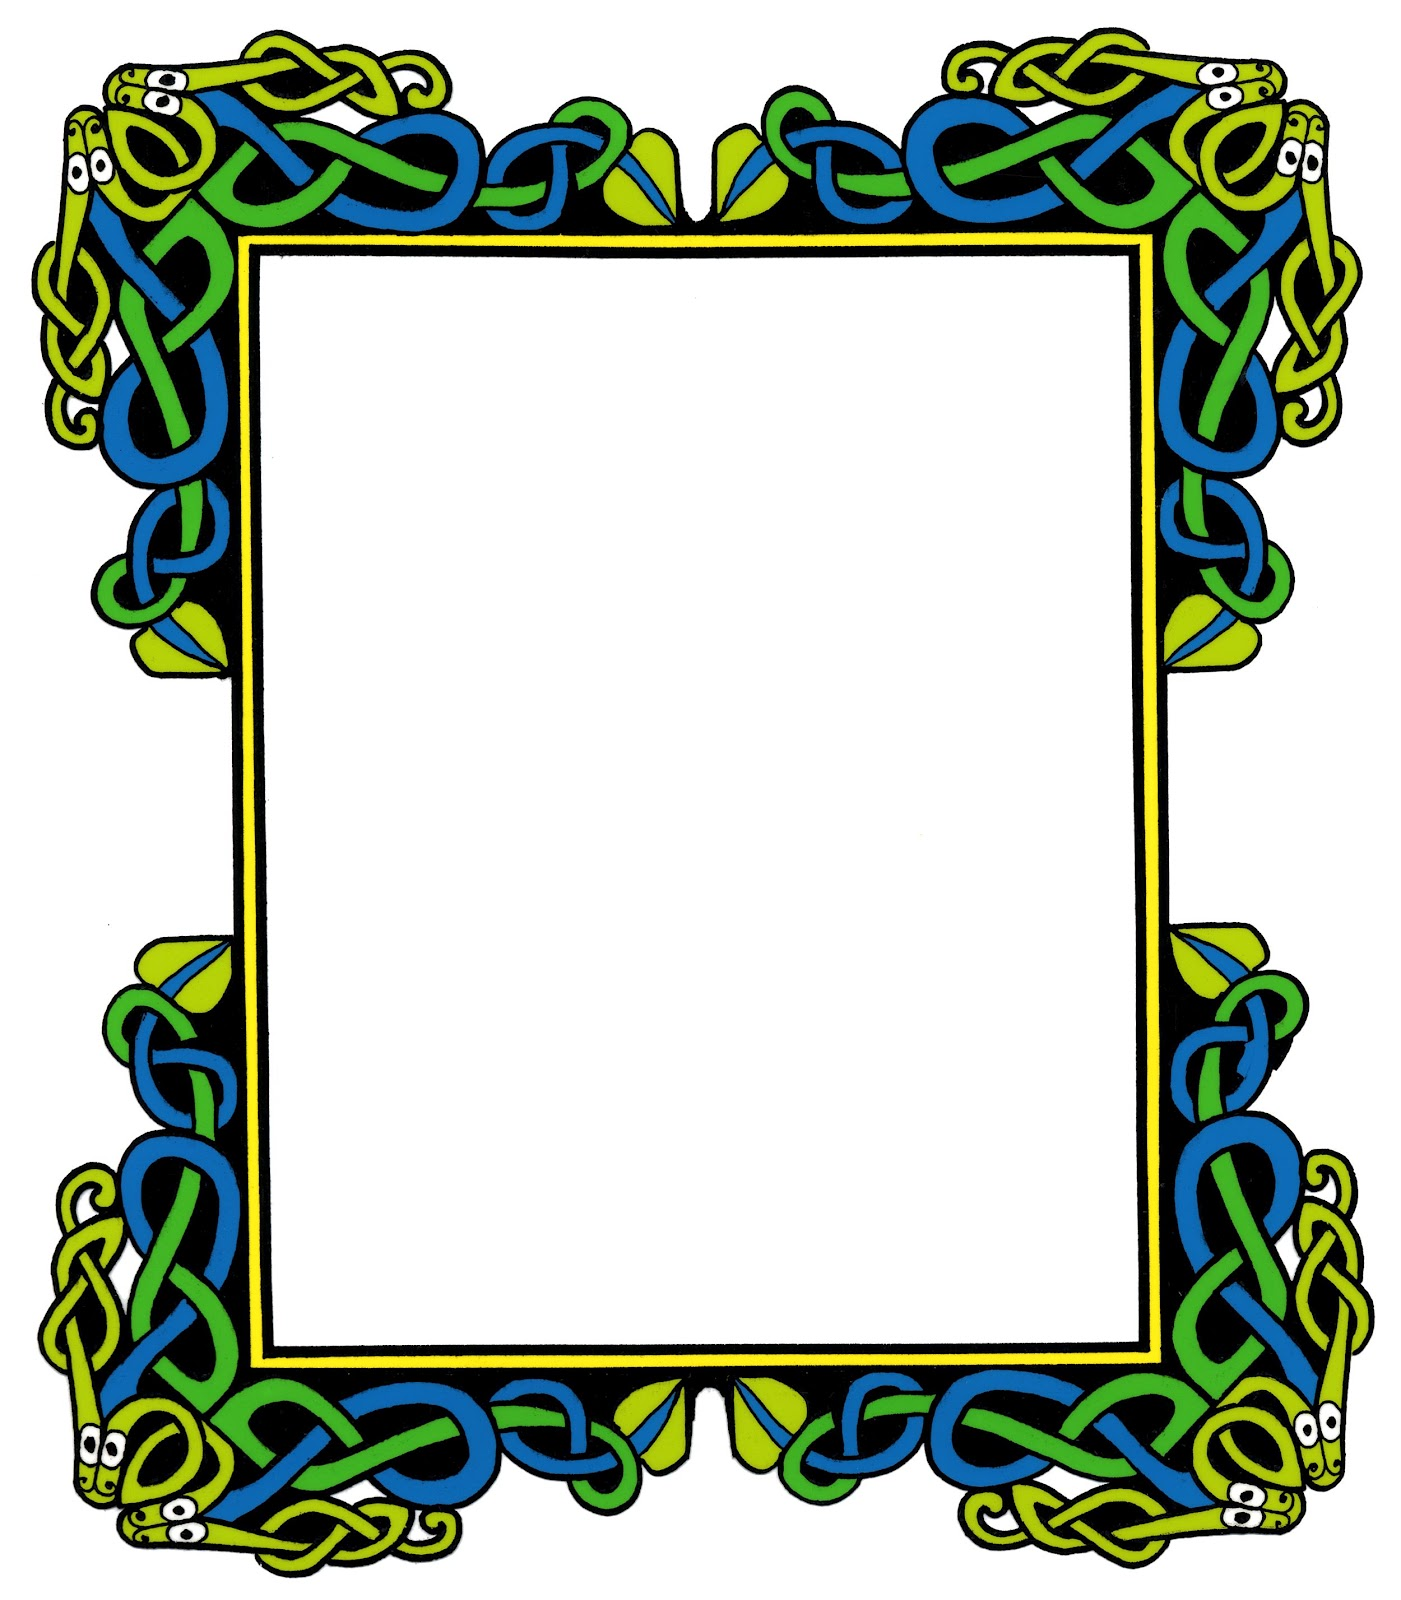 free clip art medieval borders - photo #9